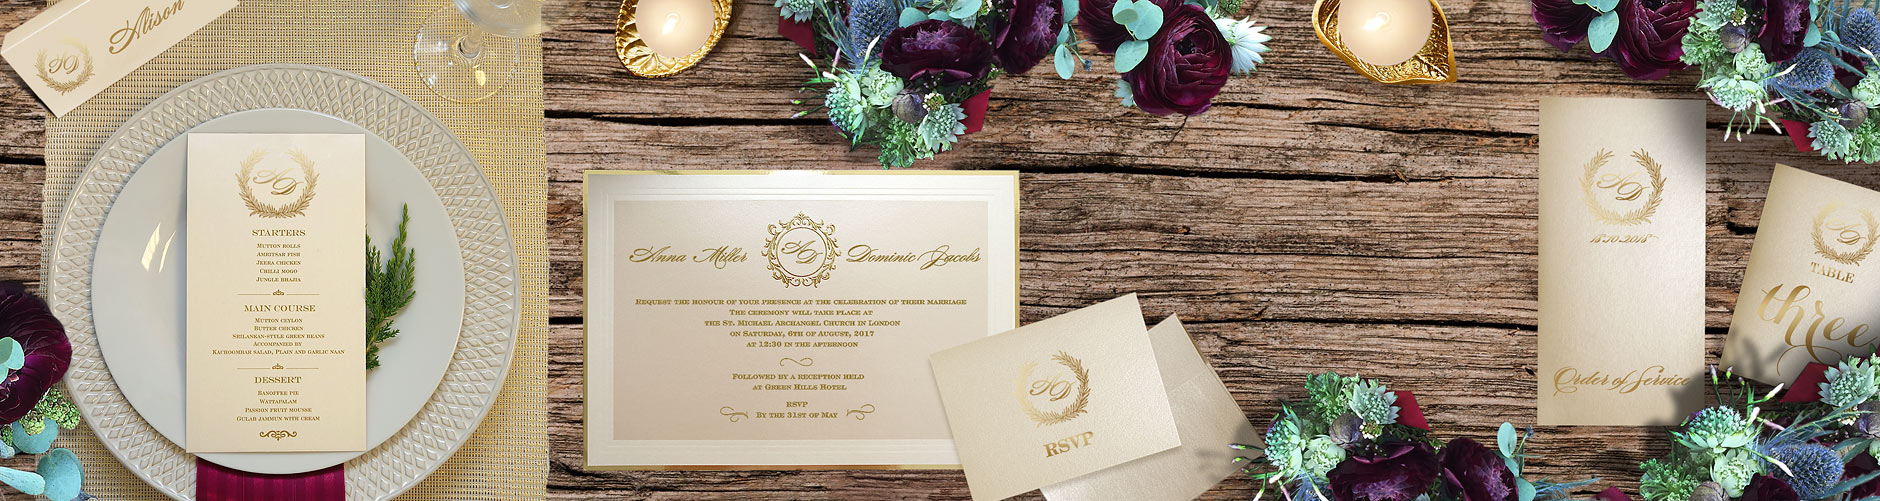 Luxury Wedding Invitations Uk Stationery Online Polina Perri